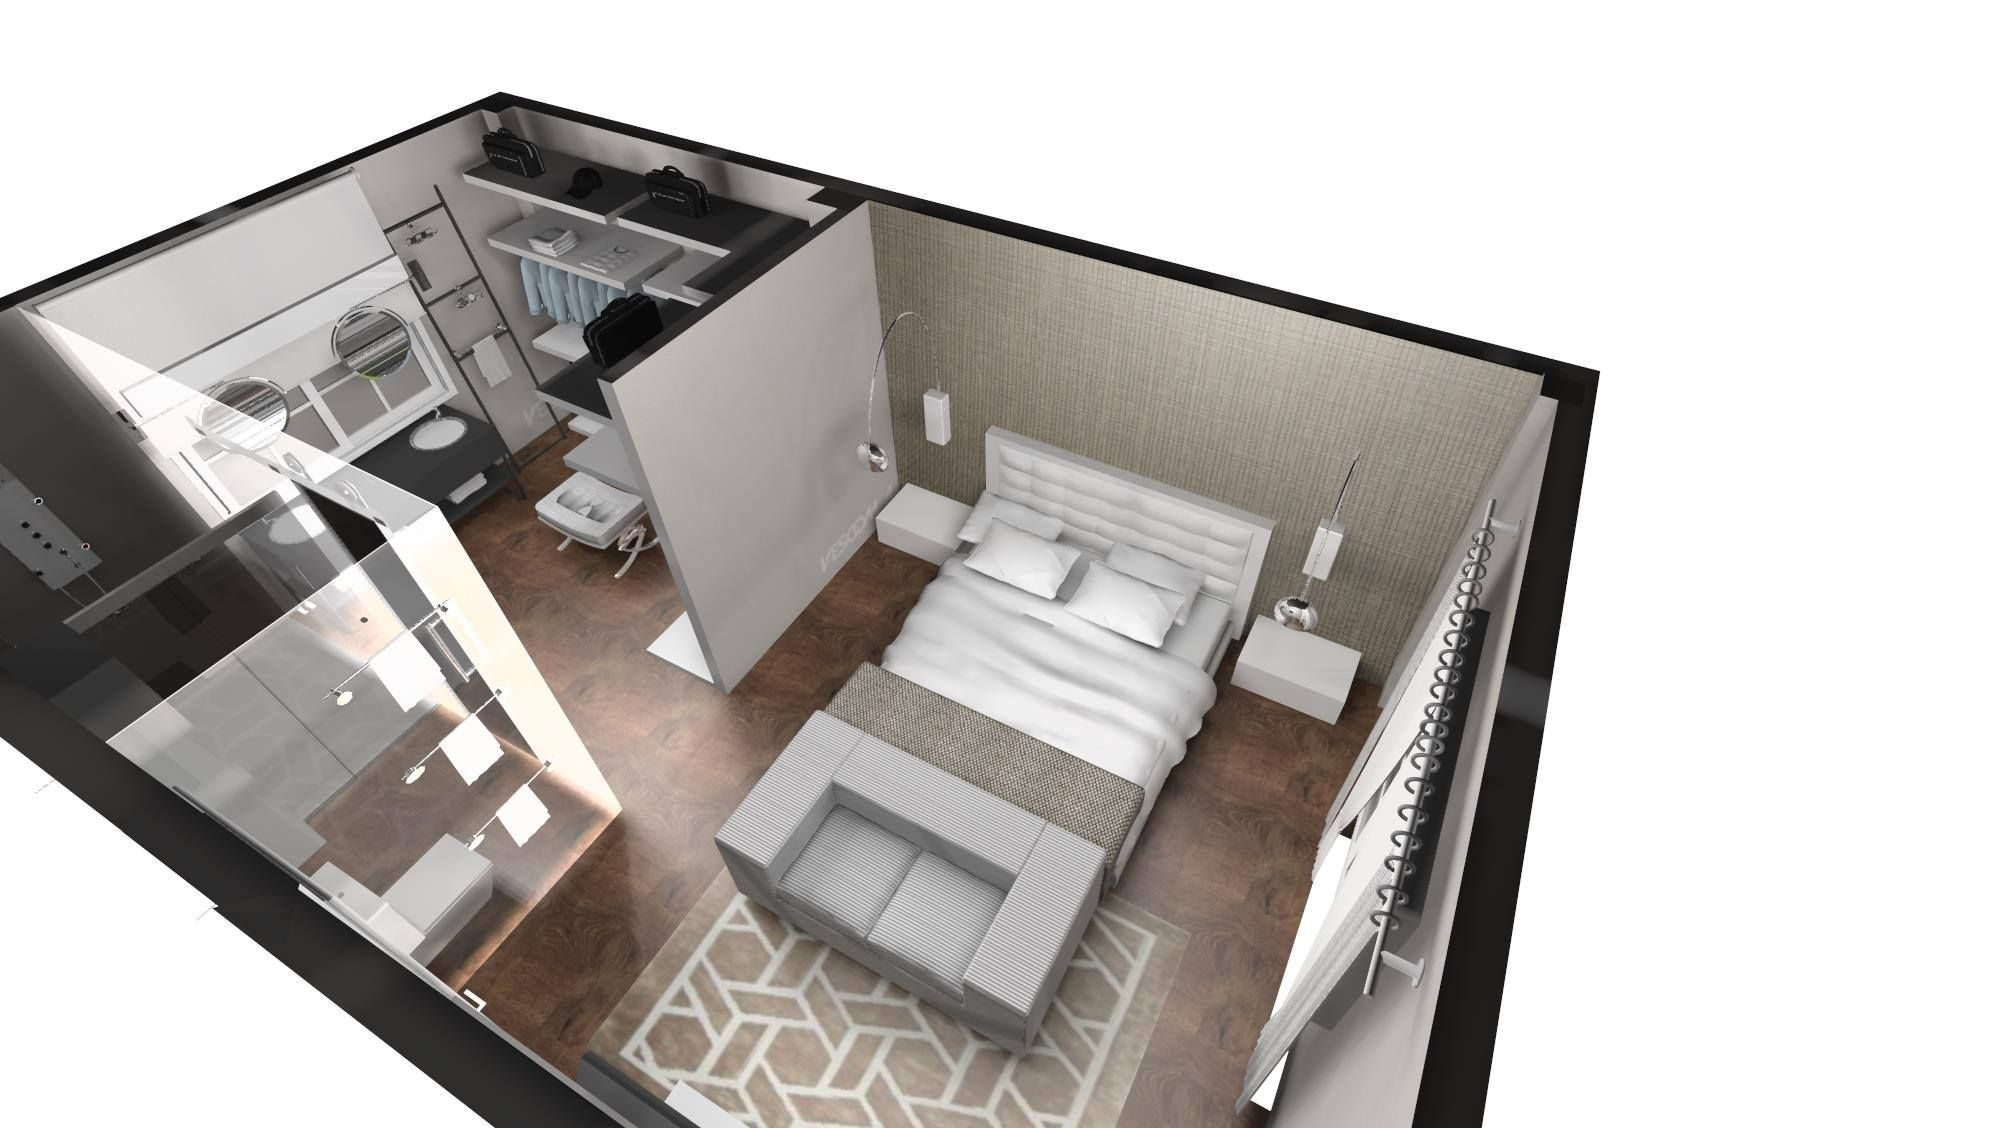 Servicio de arquitectura: Servicios de E & F Interiorismo